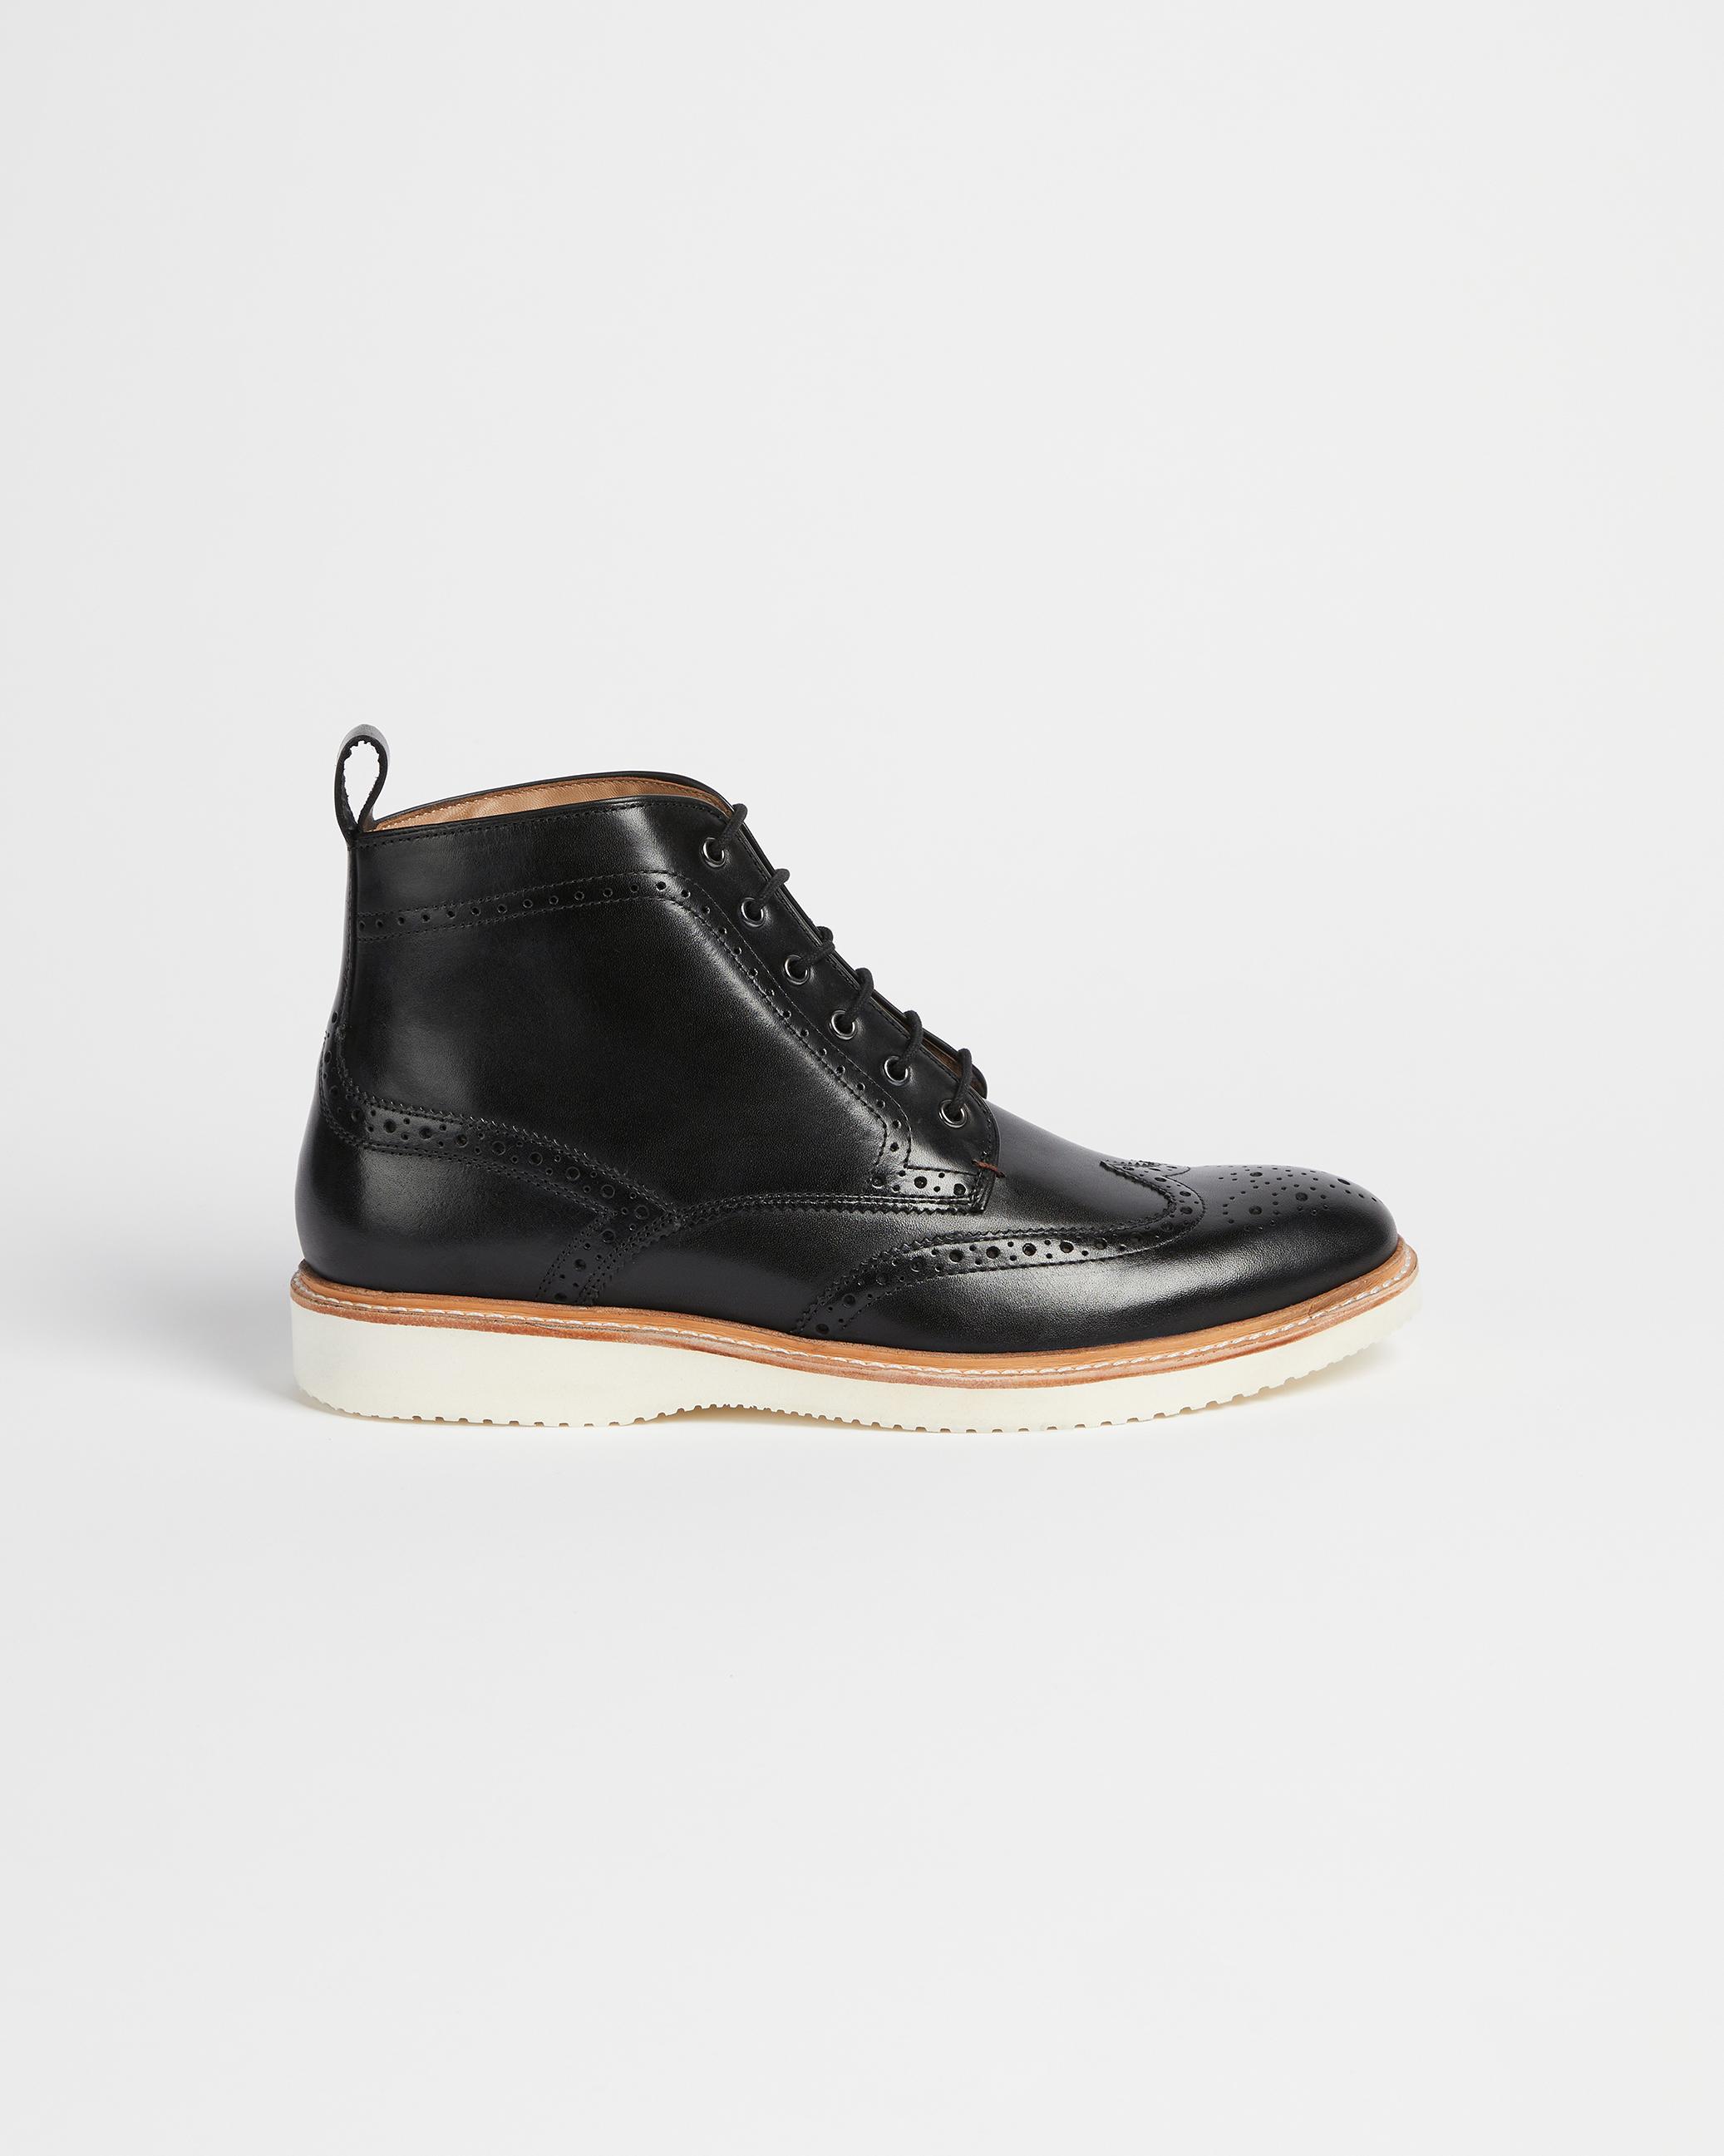 Ted Baker Men/'s Ollivur Leather Lace Up Formal Brogue Shoe Black